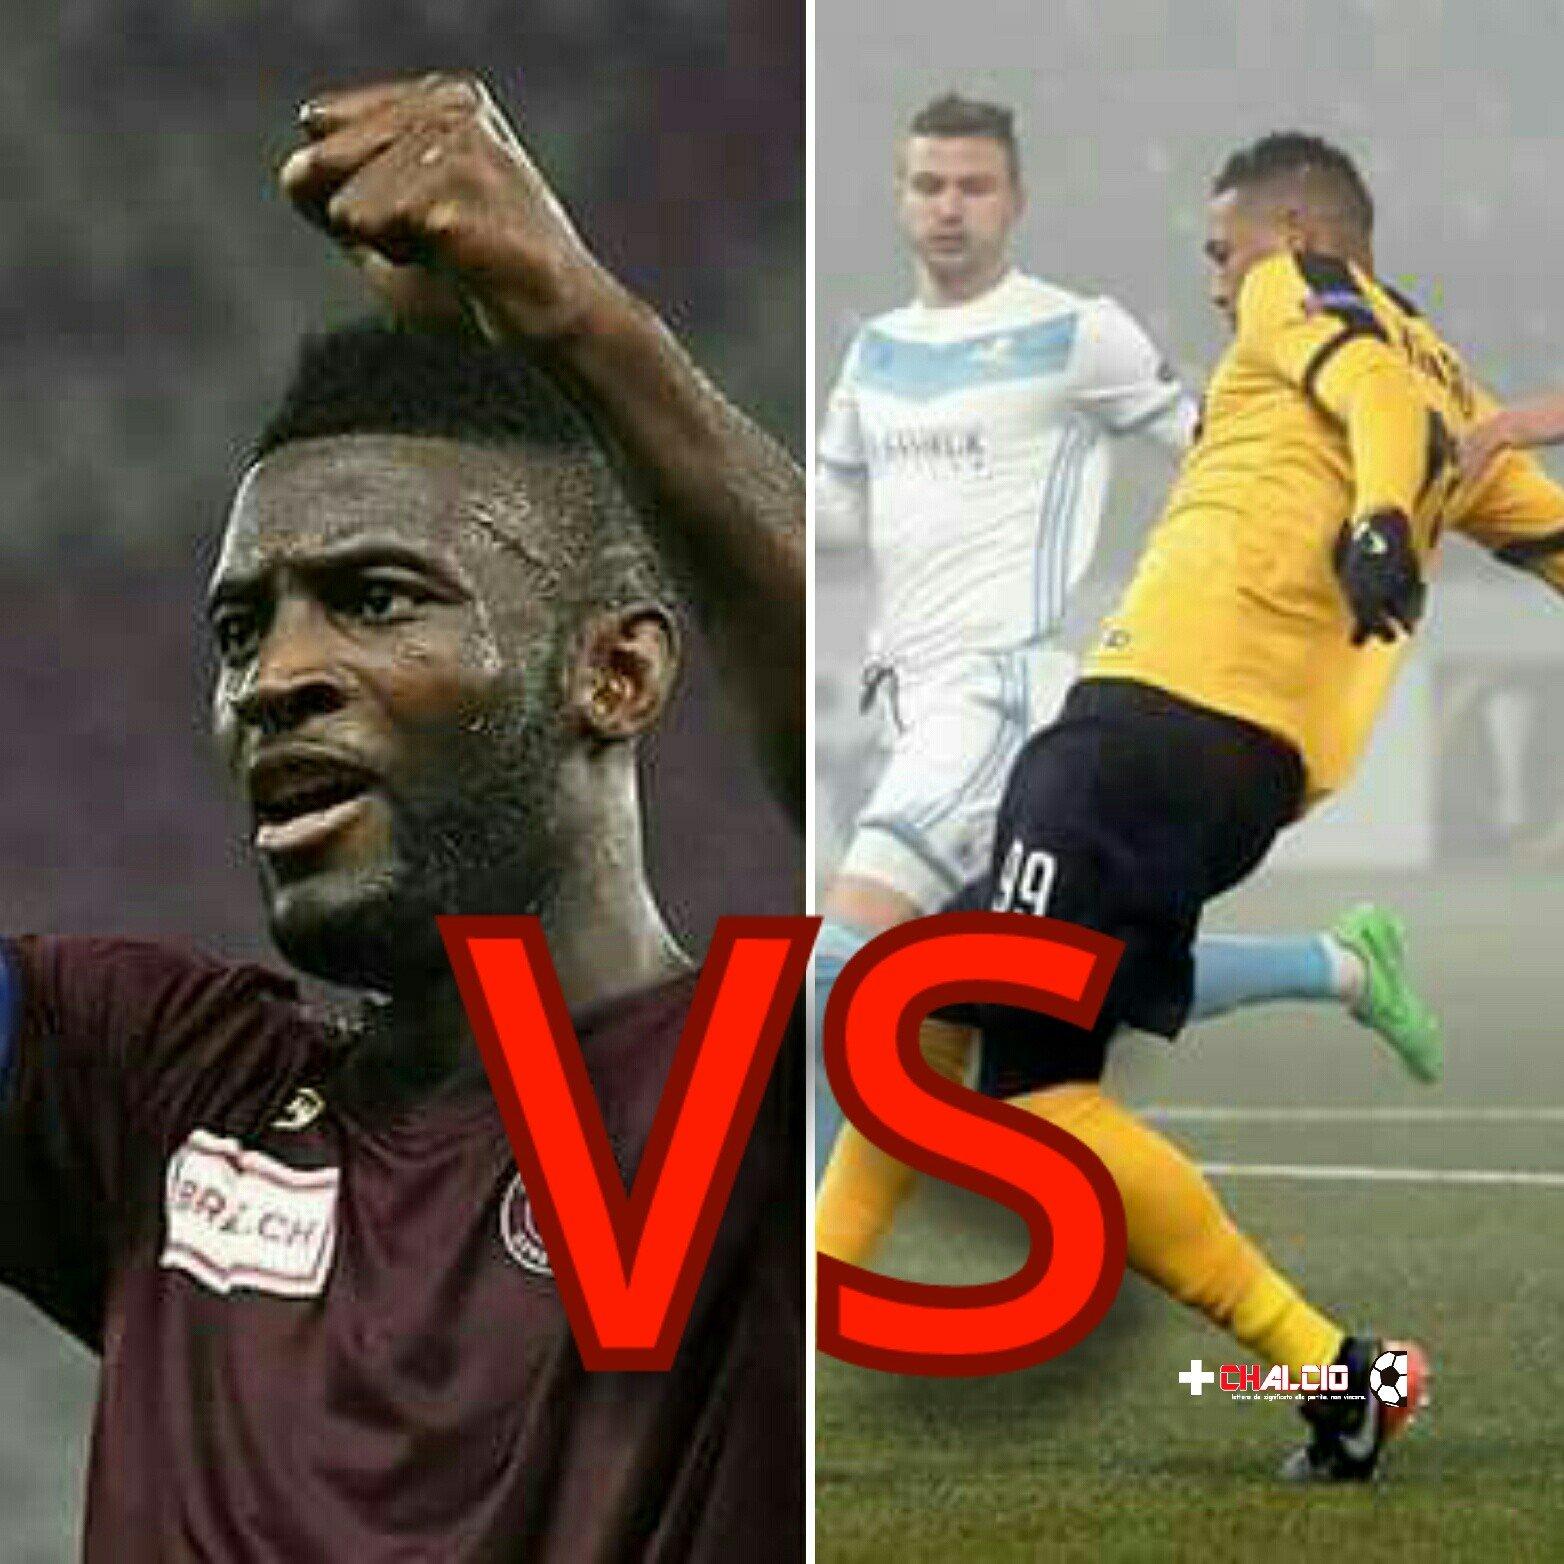 Bomber a confronto: Nsamé VS Hoarau